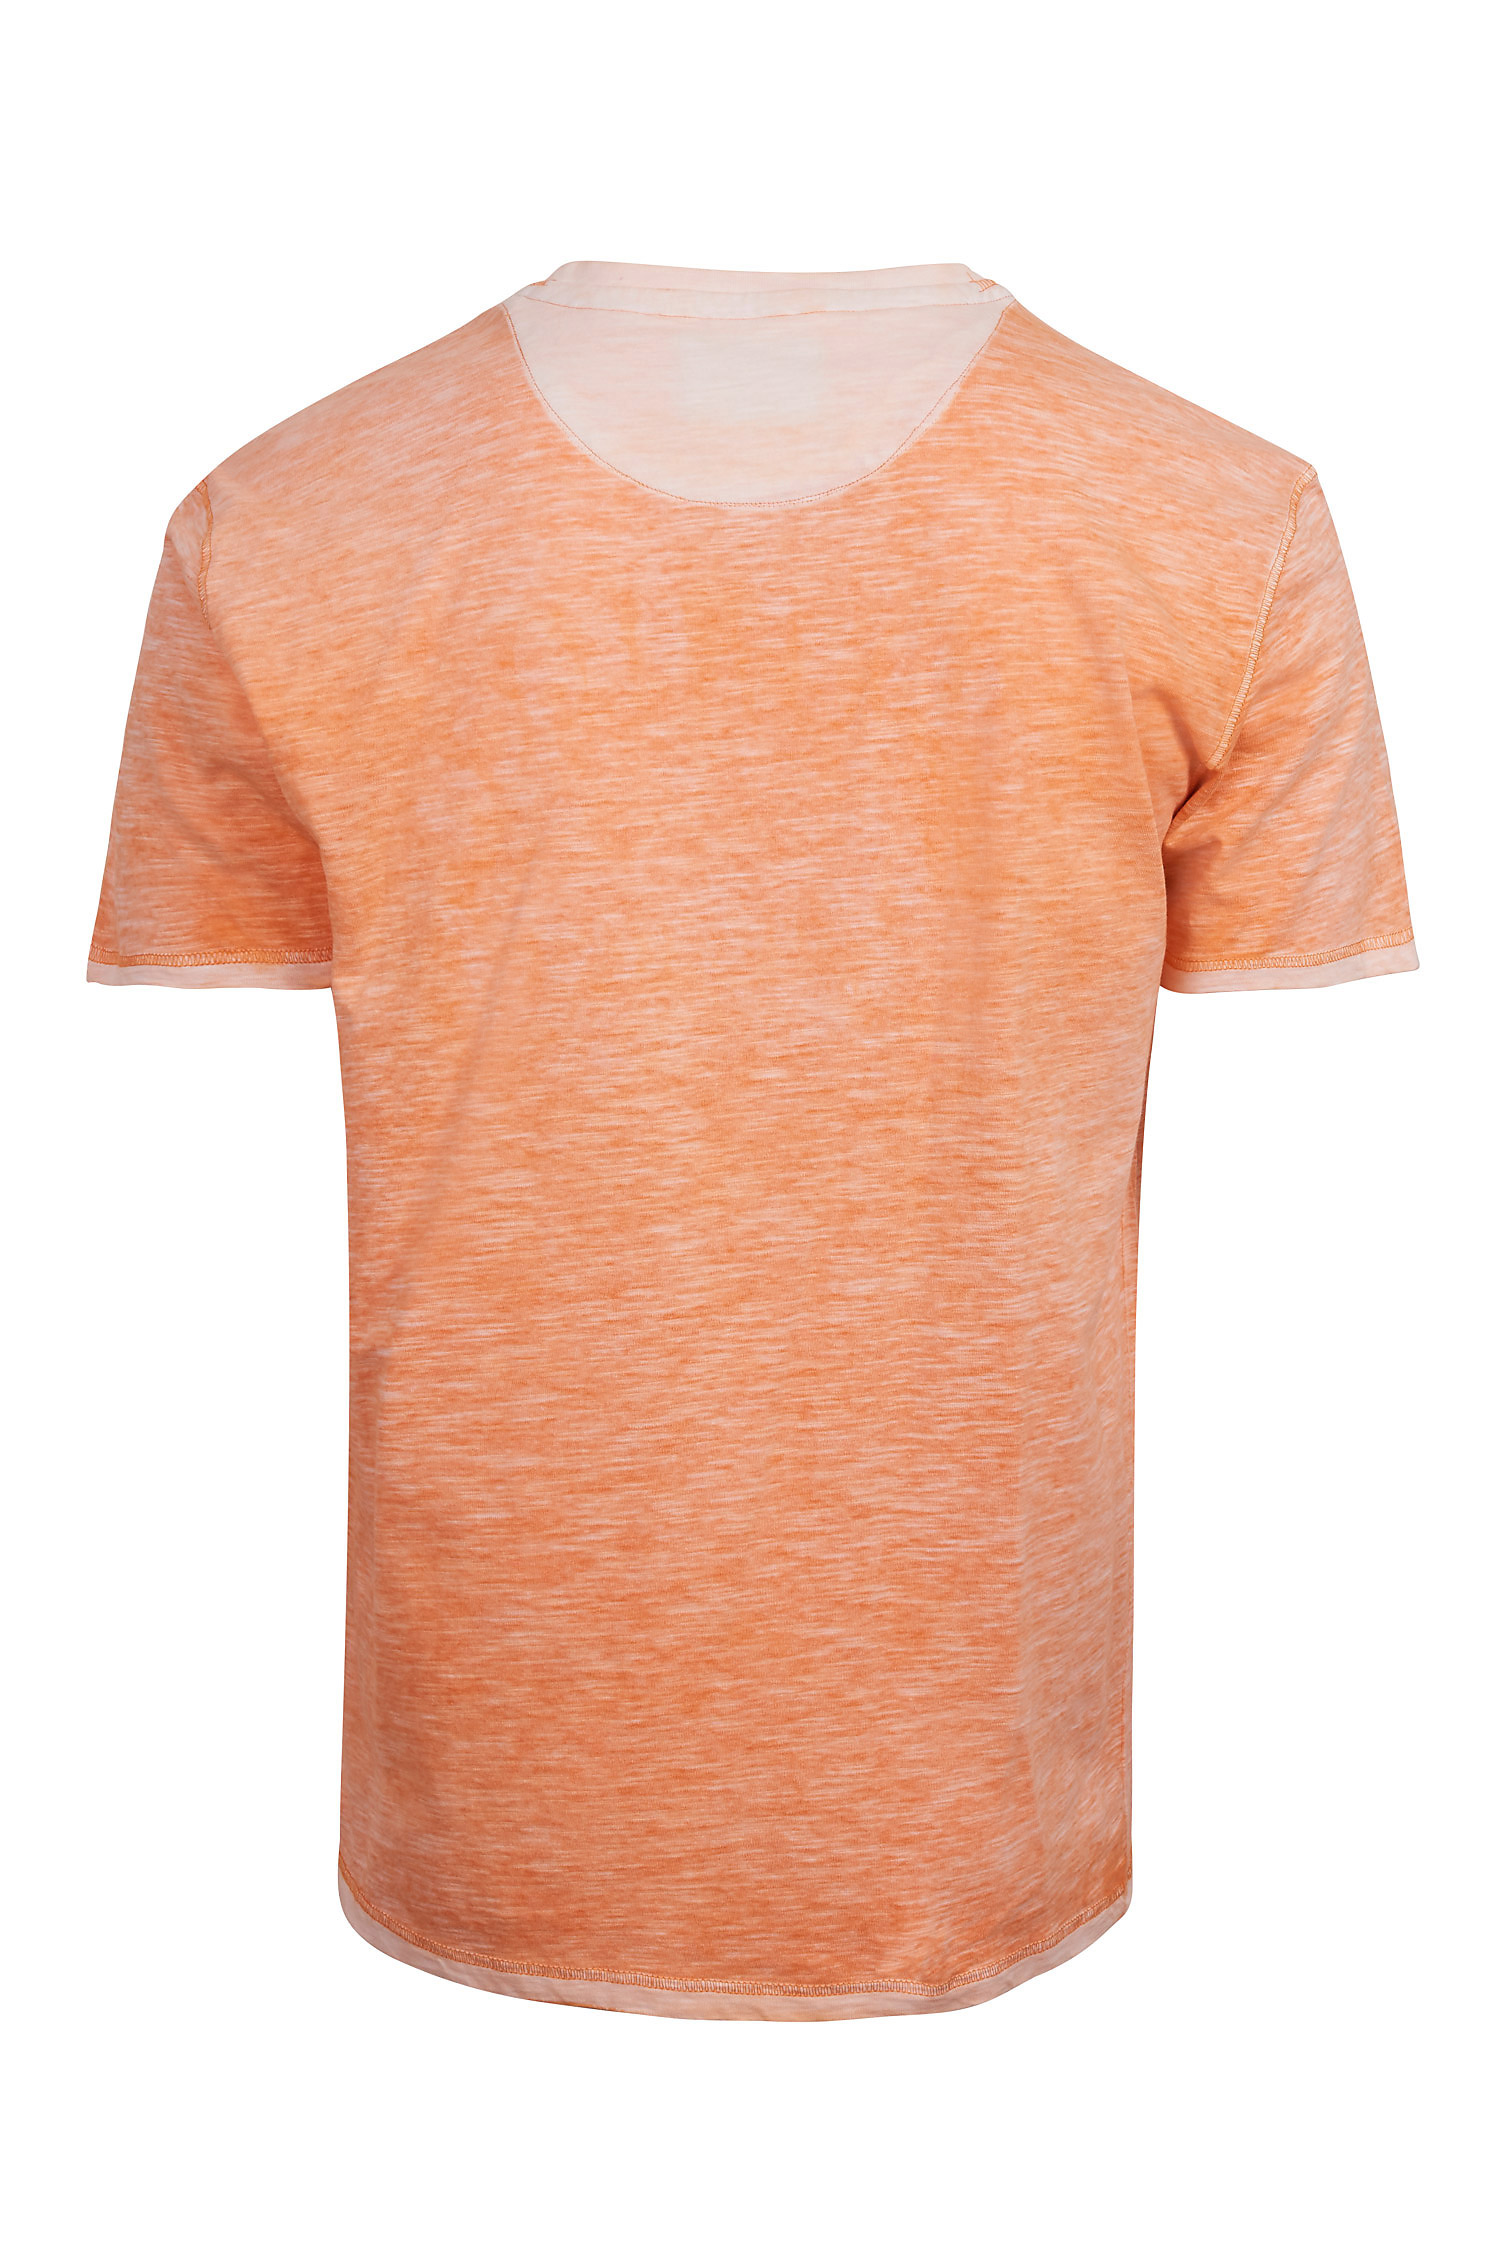 Sport, Camisetas M. Corta, 109104, NARANJA | Zoom